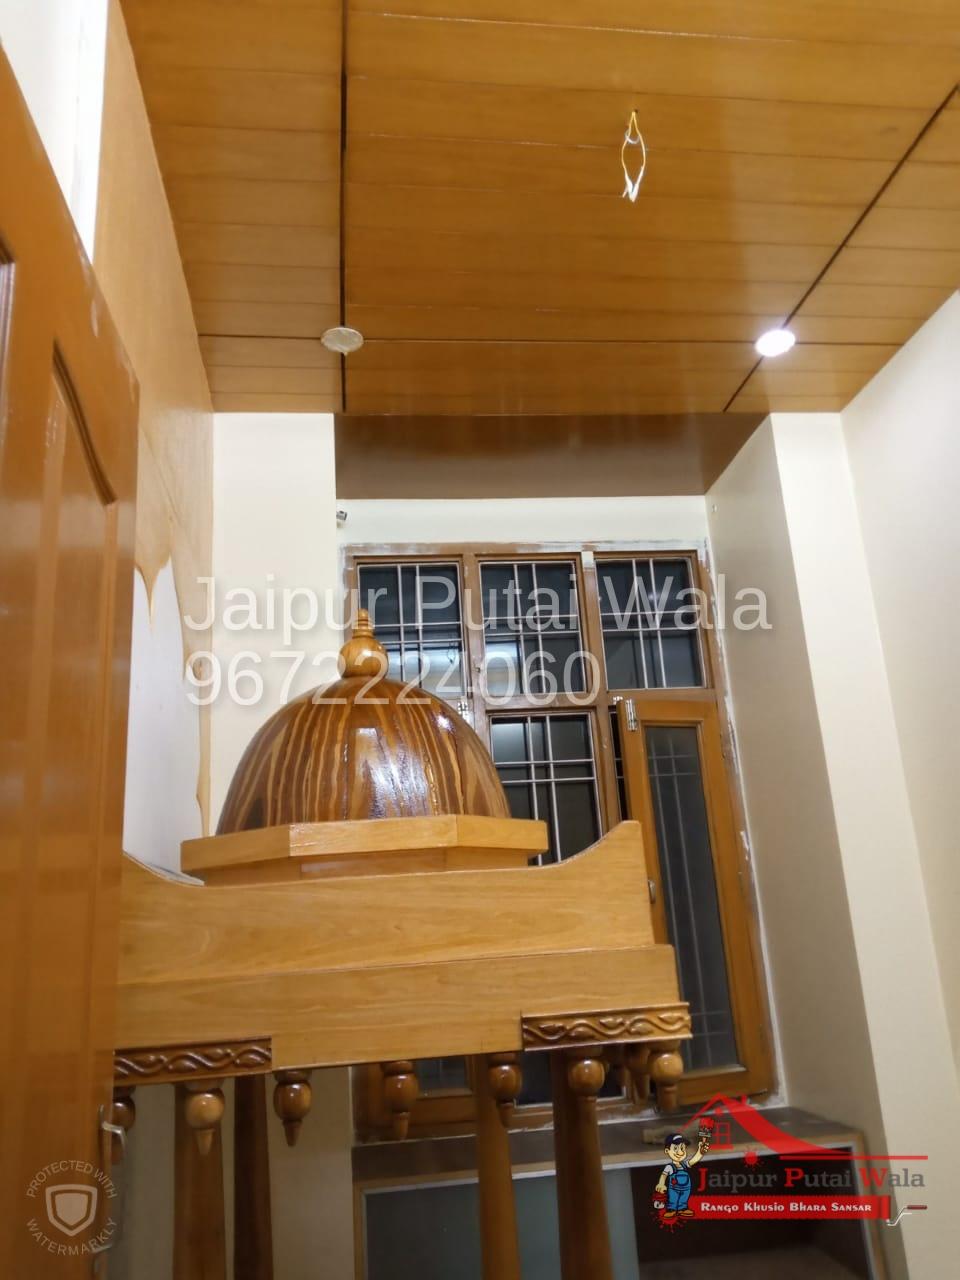 melamine-glossy-veneer-jaipur-wood-polish-6.jpeg